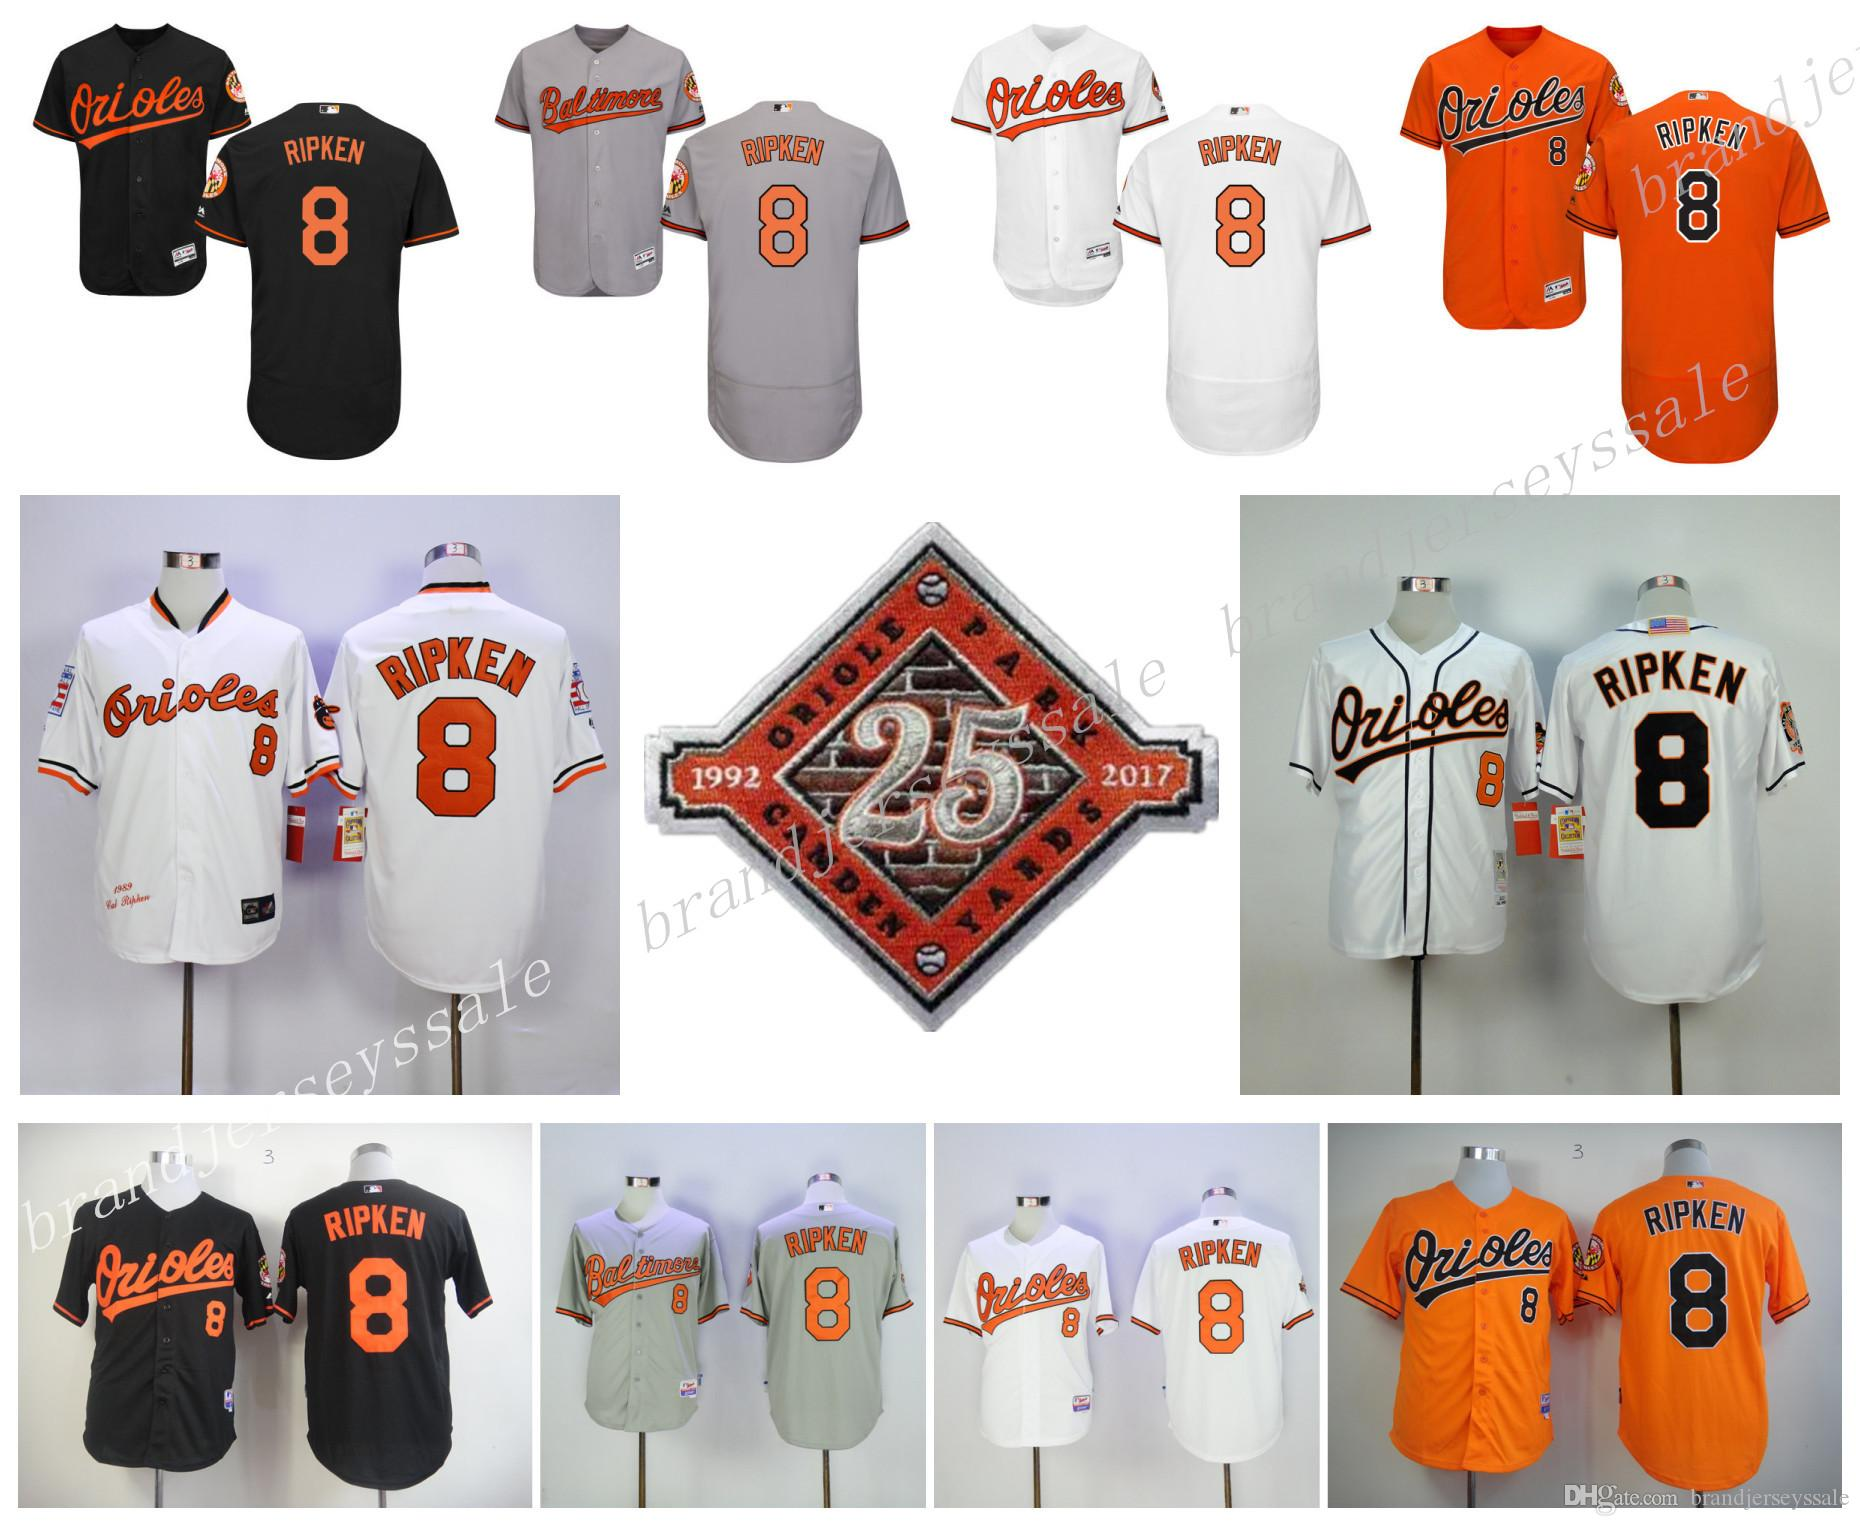 d2a4de7eec1 ... ebay 2017 mens baltimore orioles 8 cal ripken jr jerseys majestic  orange white balck gray cream